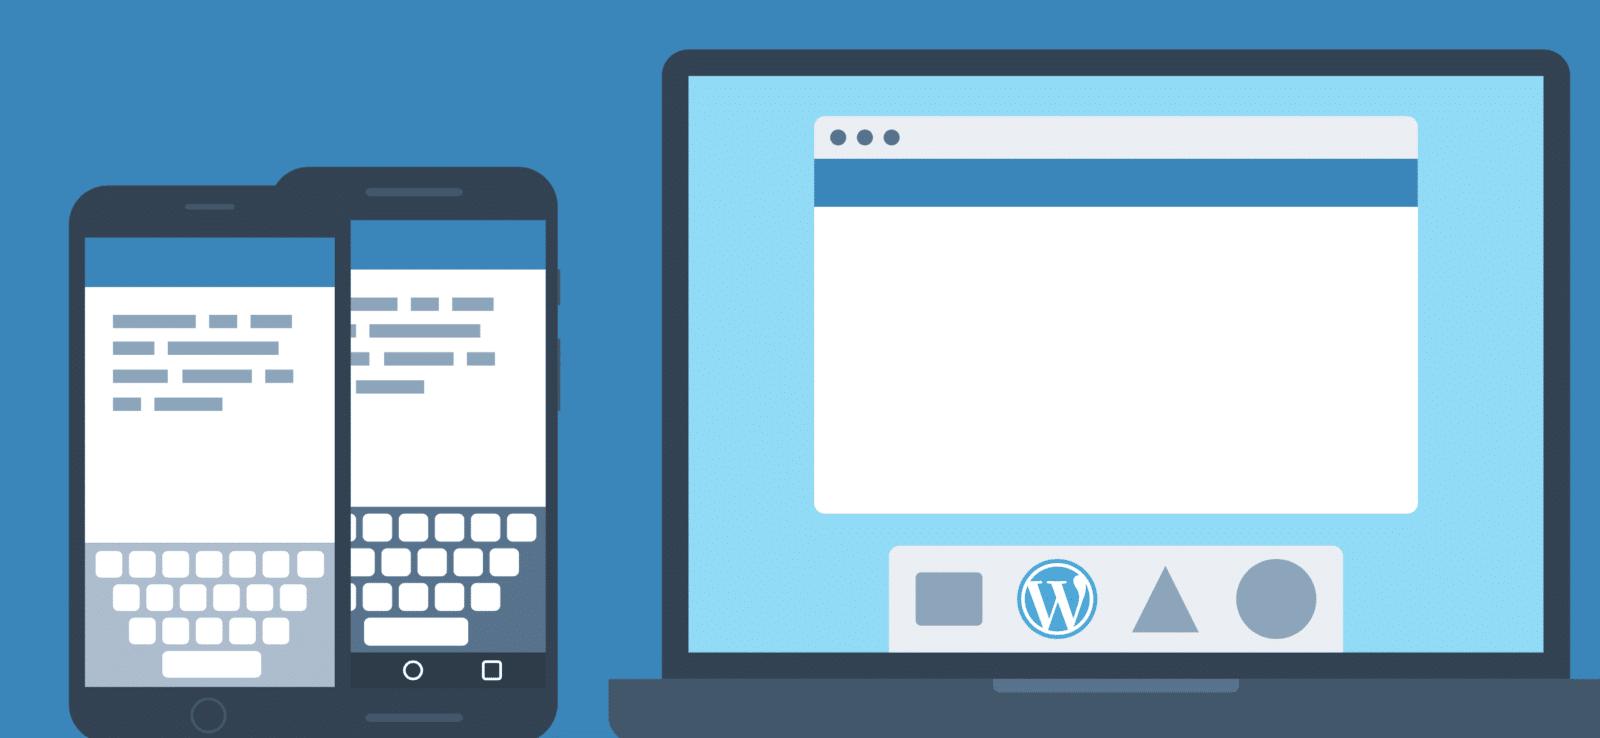 WordPress.com และ .org ต่างกันอย่างไร จะทำเว็บต้องใช้แบบไหน เสียเงินไหม